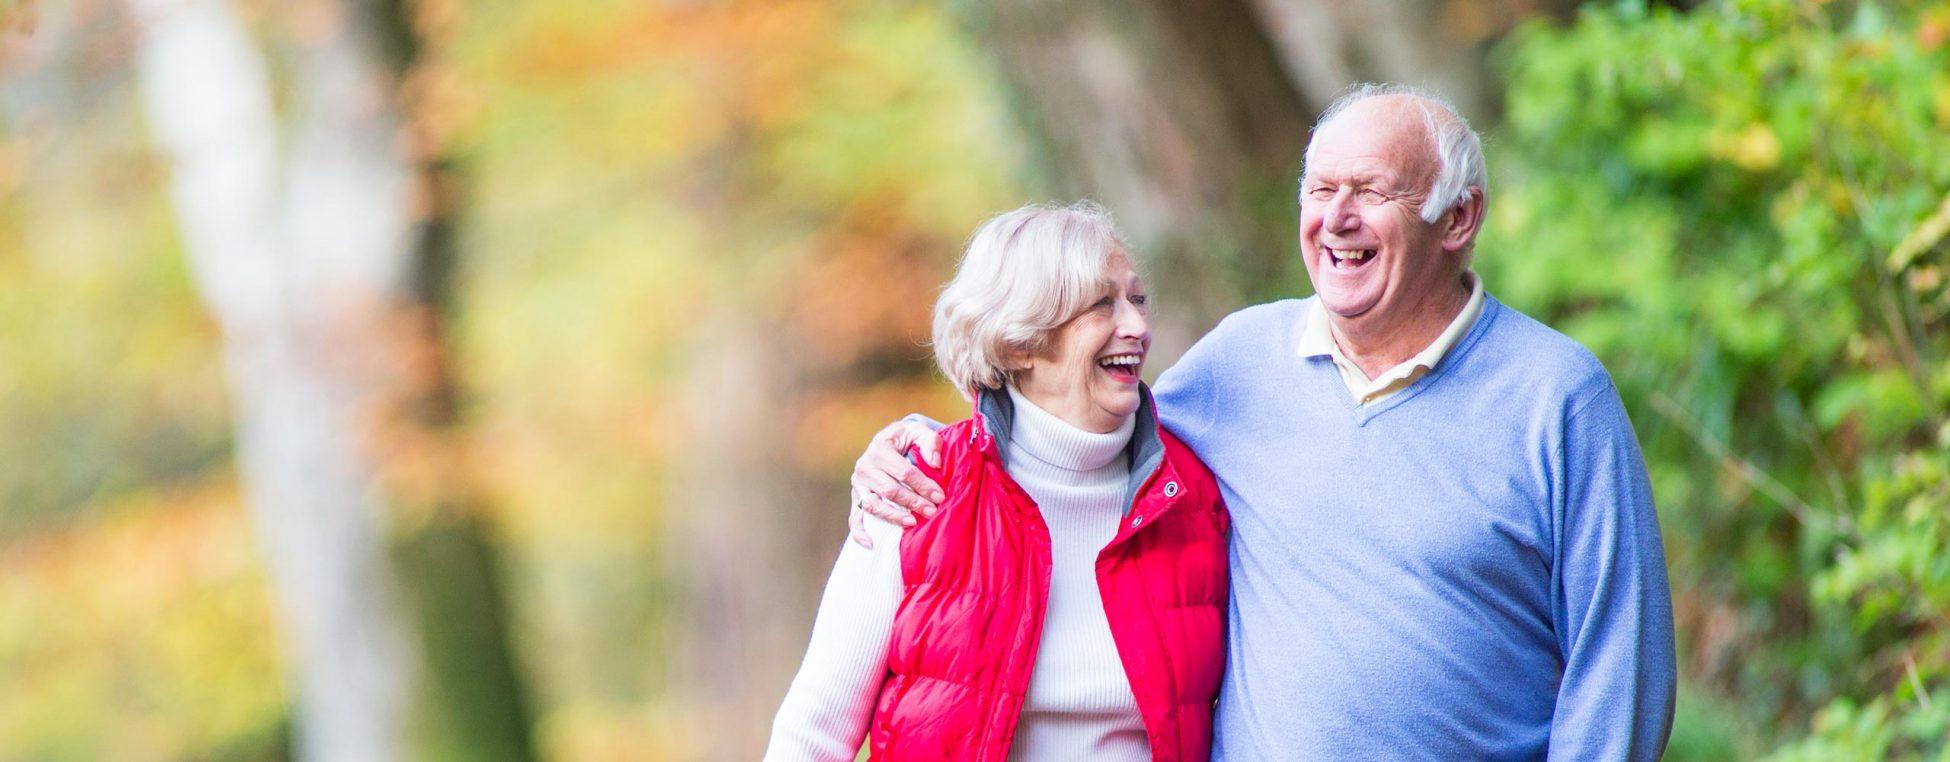 Vorsorge Osteoporose - Älteres Paar im Wald